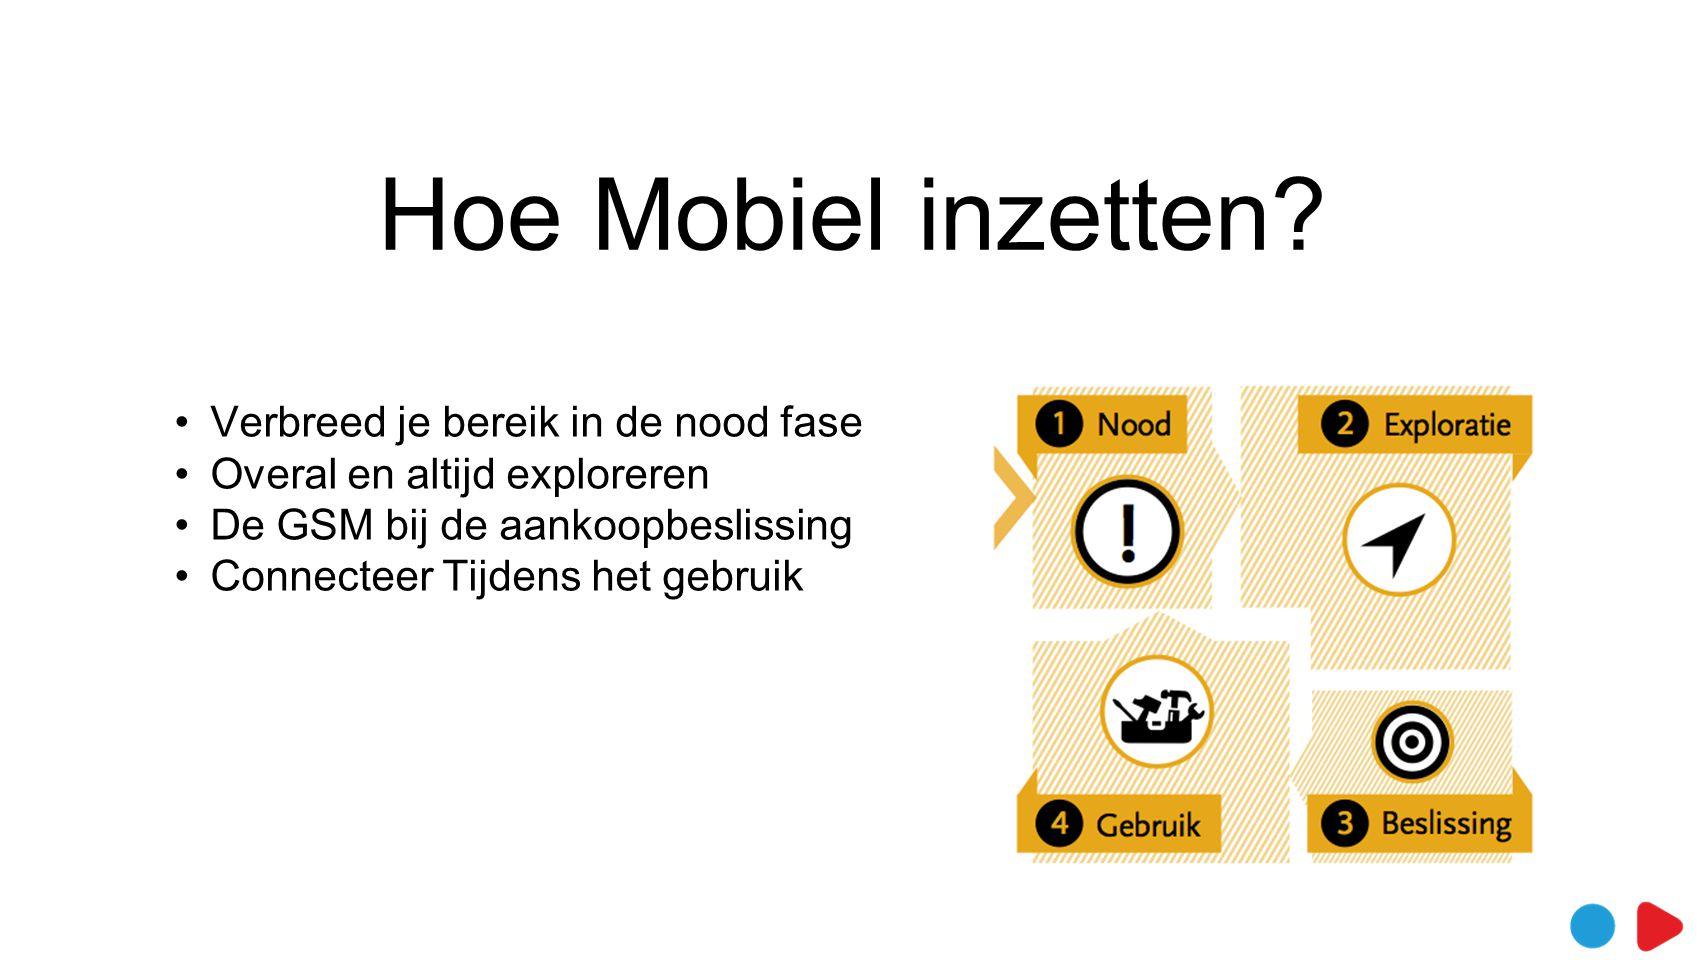 Hoe Mobiel inzetten Verbreed je bereik in de nood fase